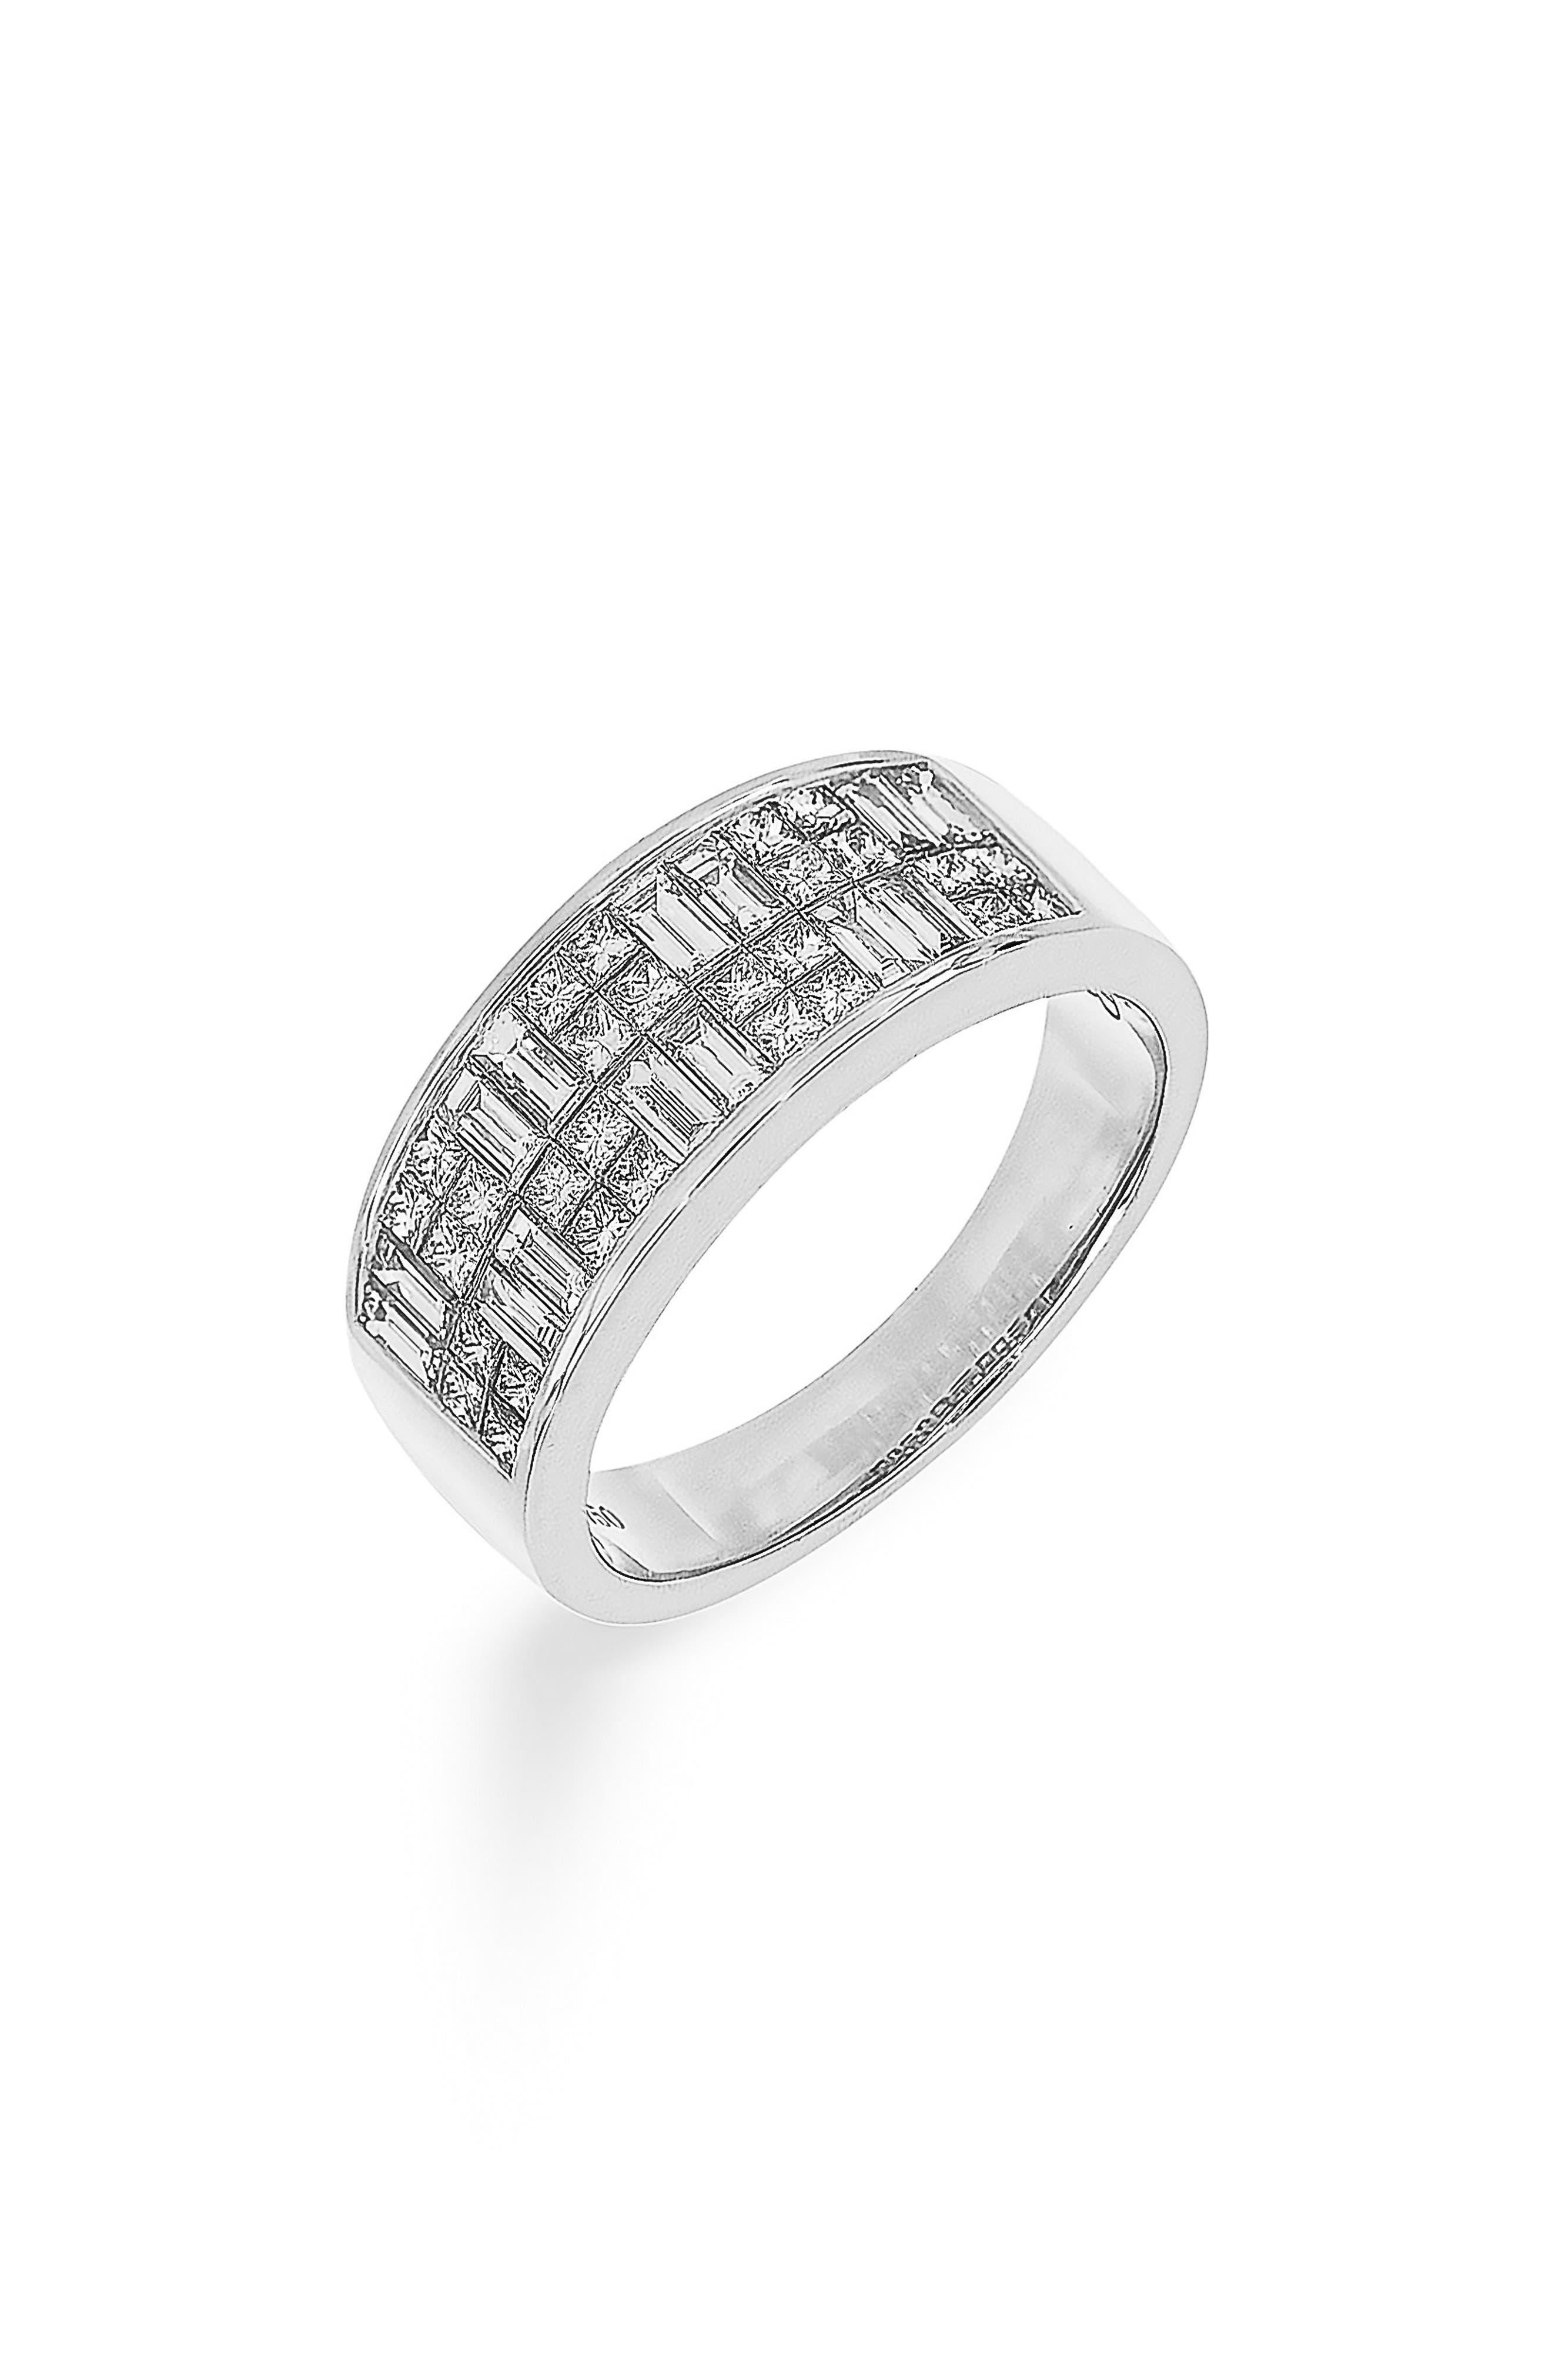 Mixed Shape Diamond Ring,                         Main,                         color, WHITE GOLD